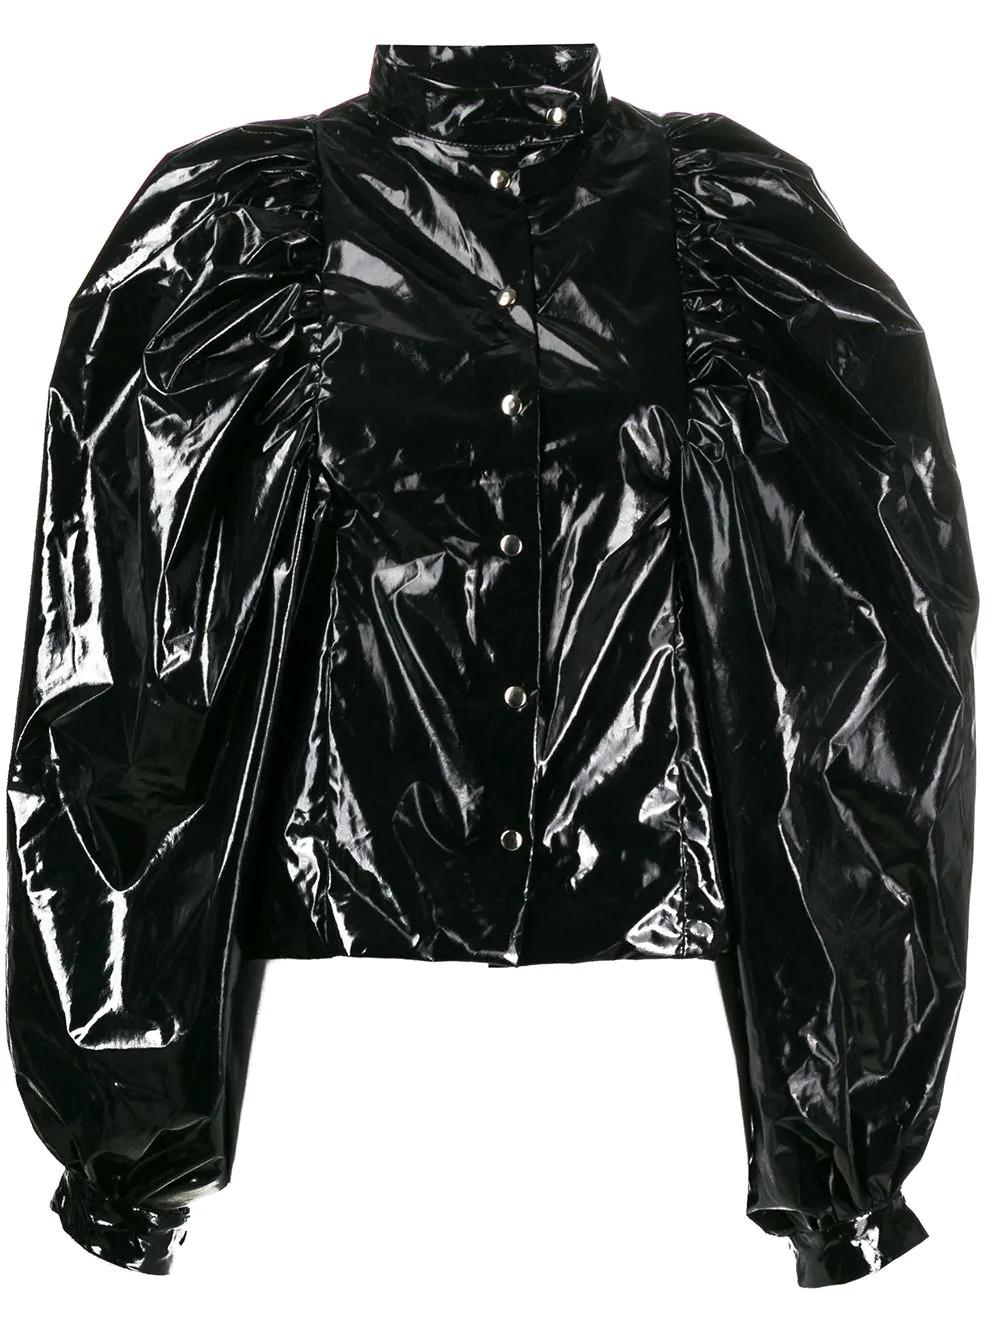 AW19048 BLACK